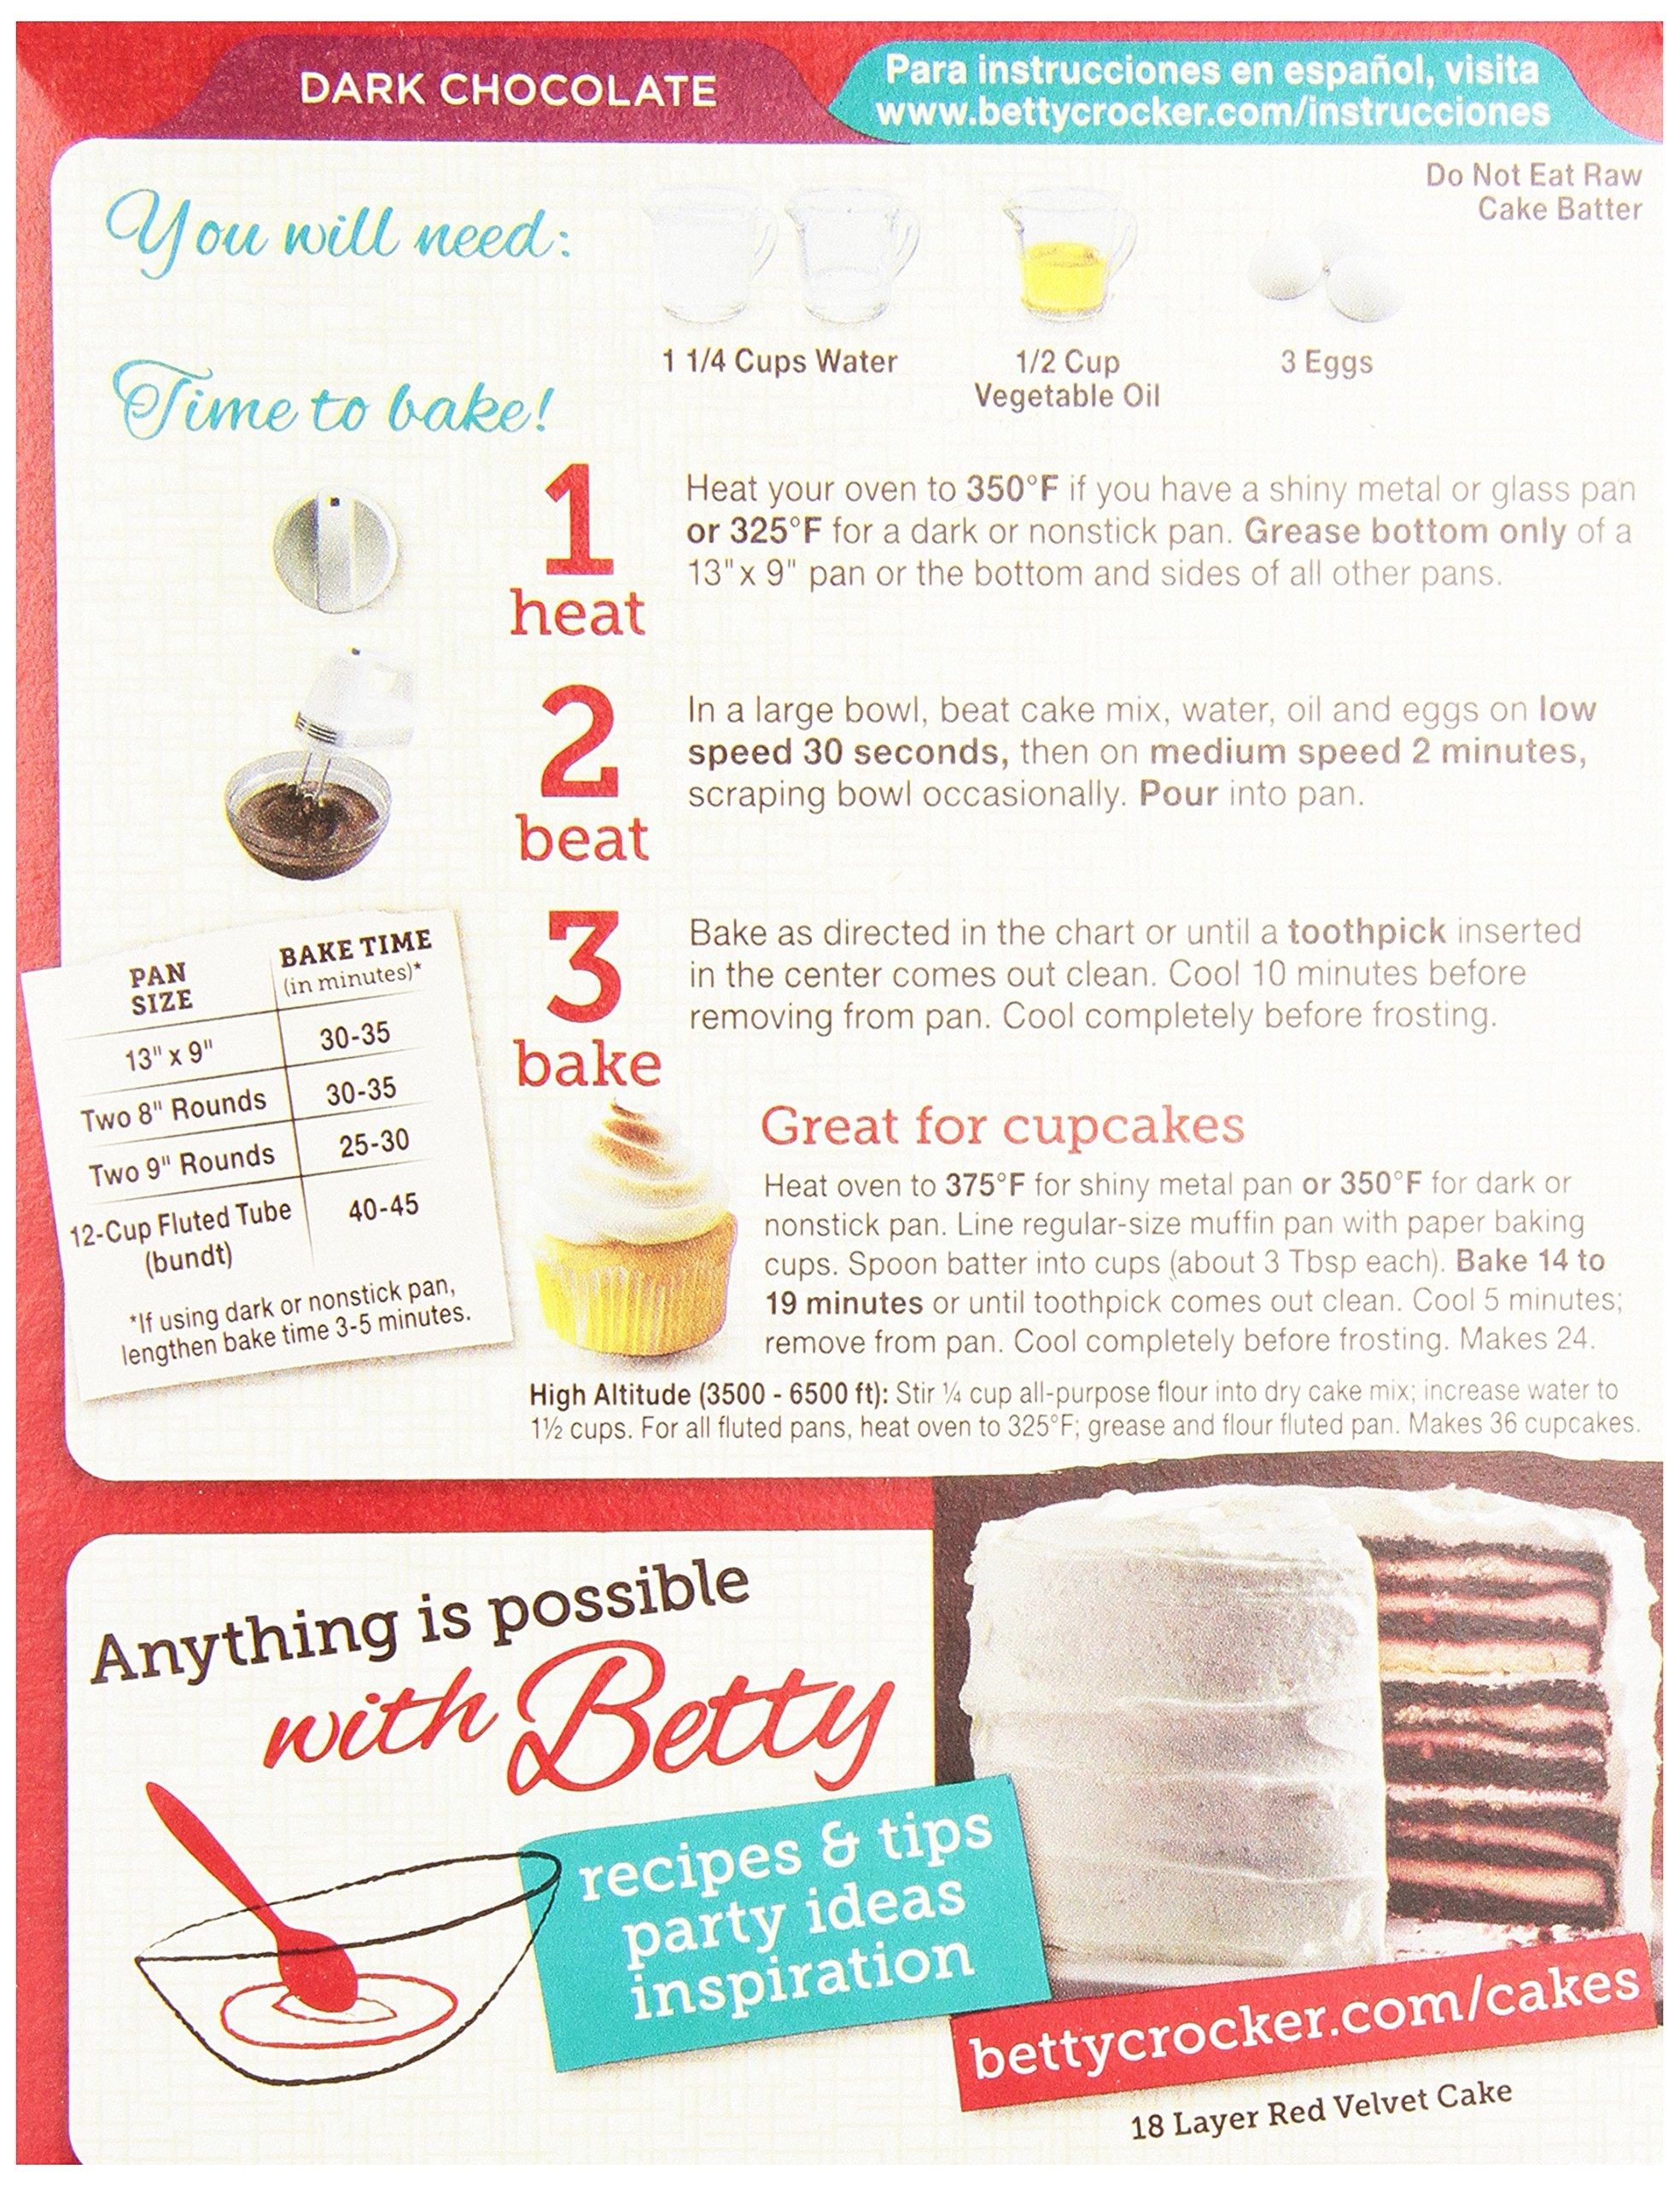 Betty Crocker Super Moist Cake Mix Dark Chocolate 15.25 oz Box (pack of 6) by Betty Crocker (Image #4)